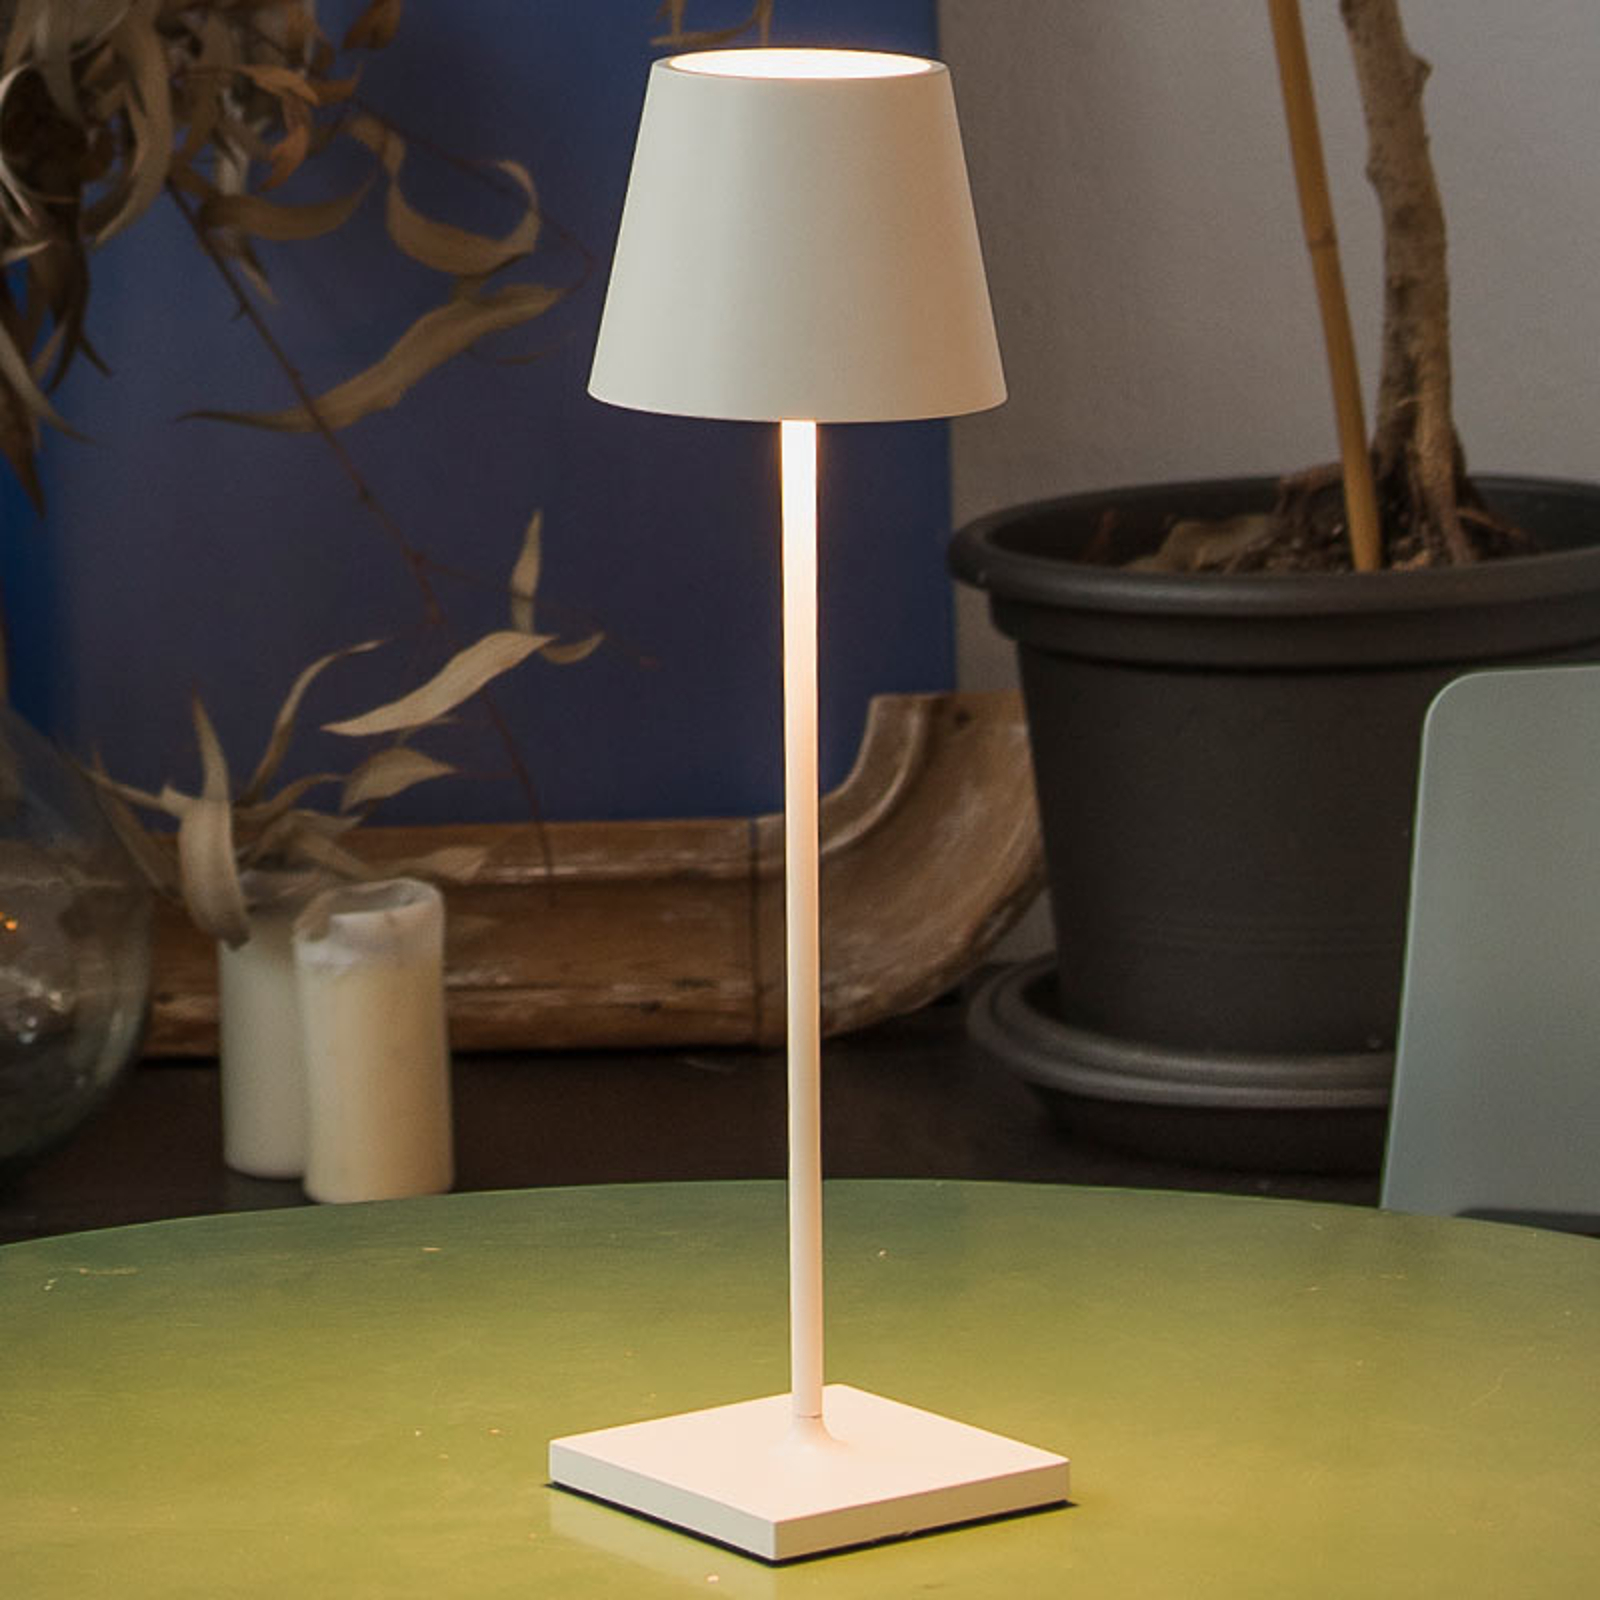 Lampada LED da tavolo Toc con porta USB, IP54